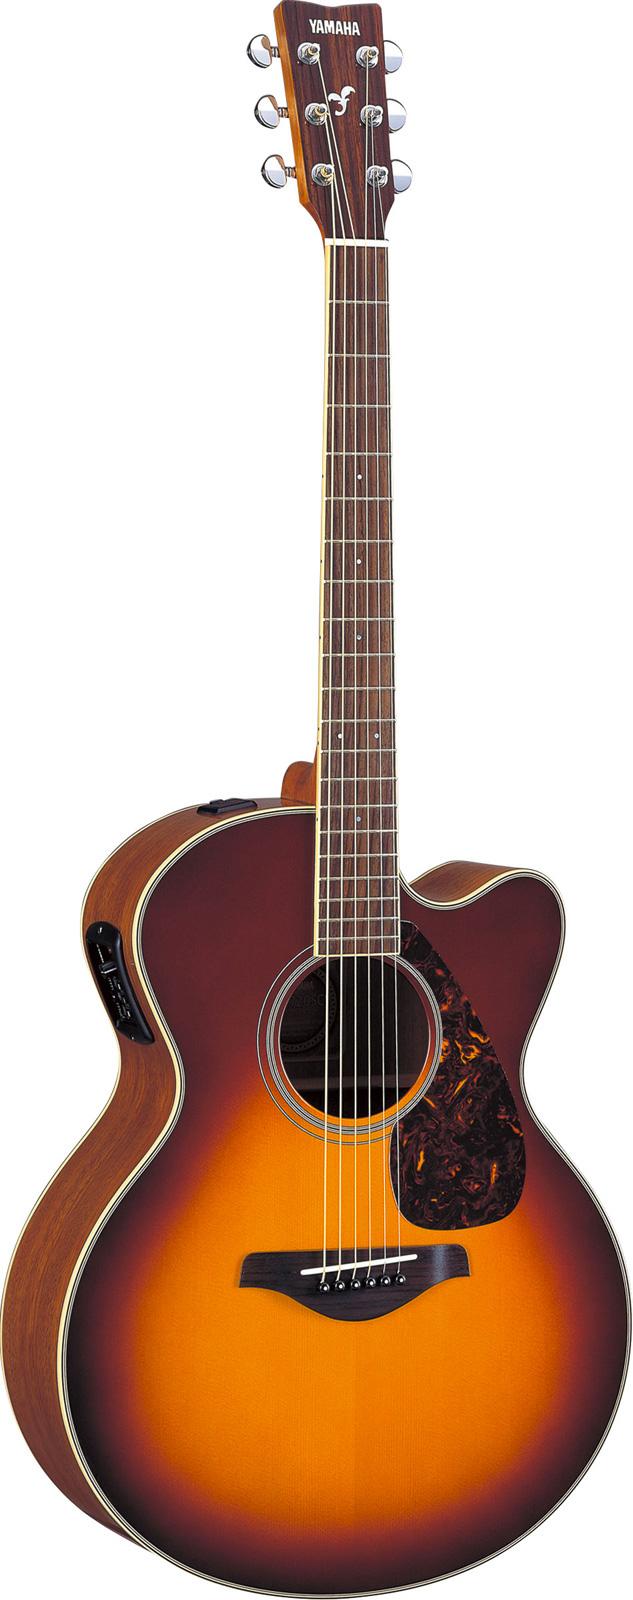 Yamaha Fjx720sciibs Brown Sunburst